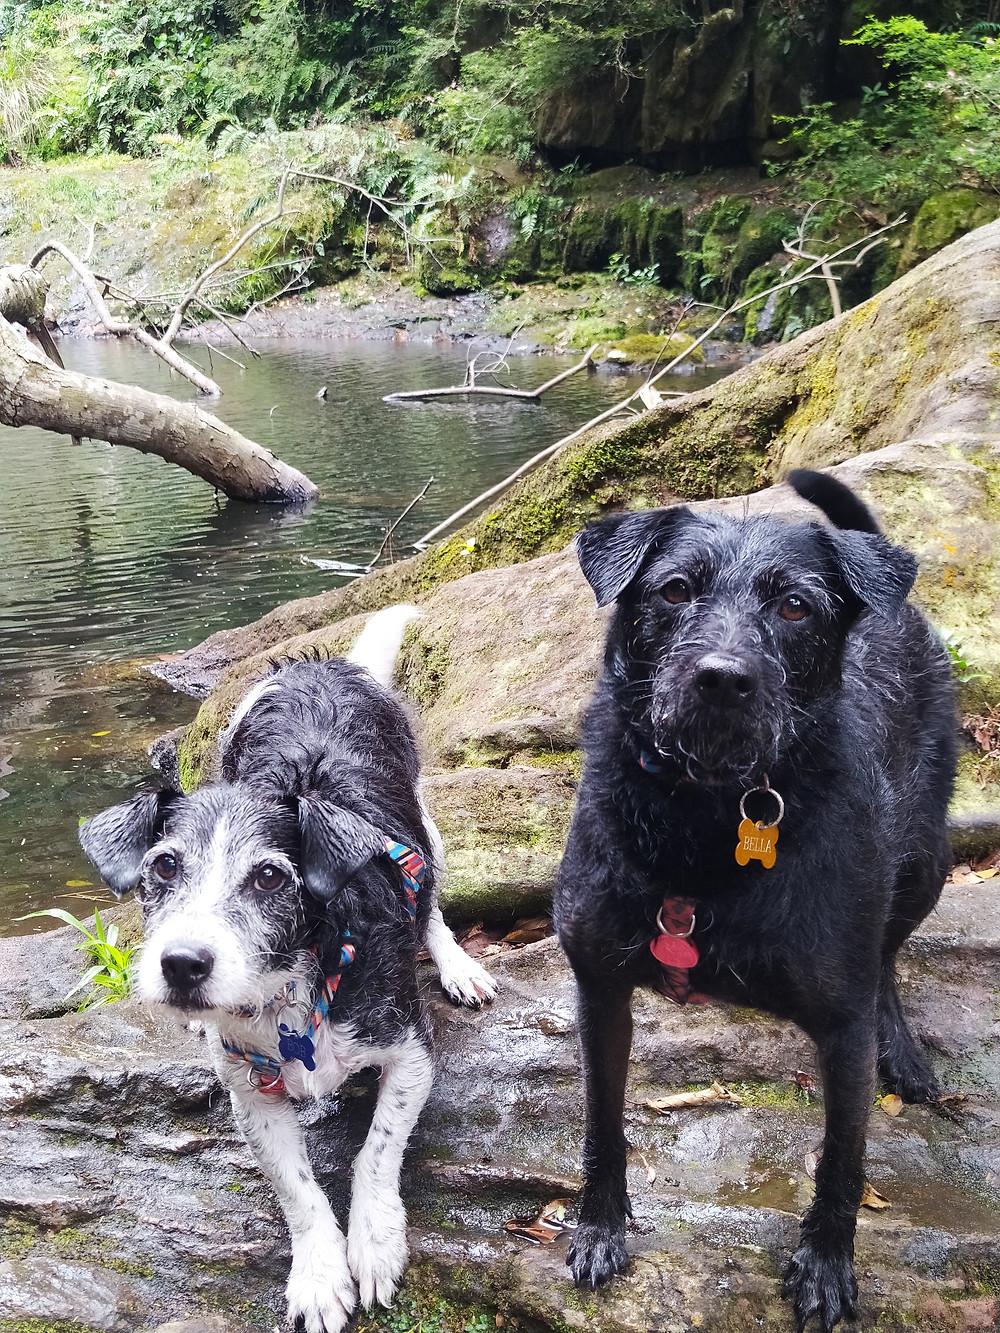 cachoeira palmito mole, cachoeira da invernada, pet friendly